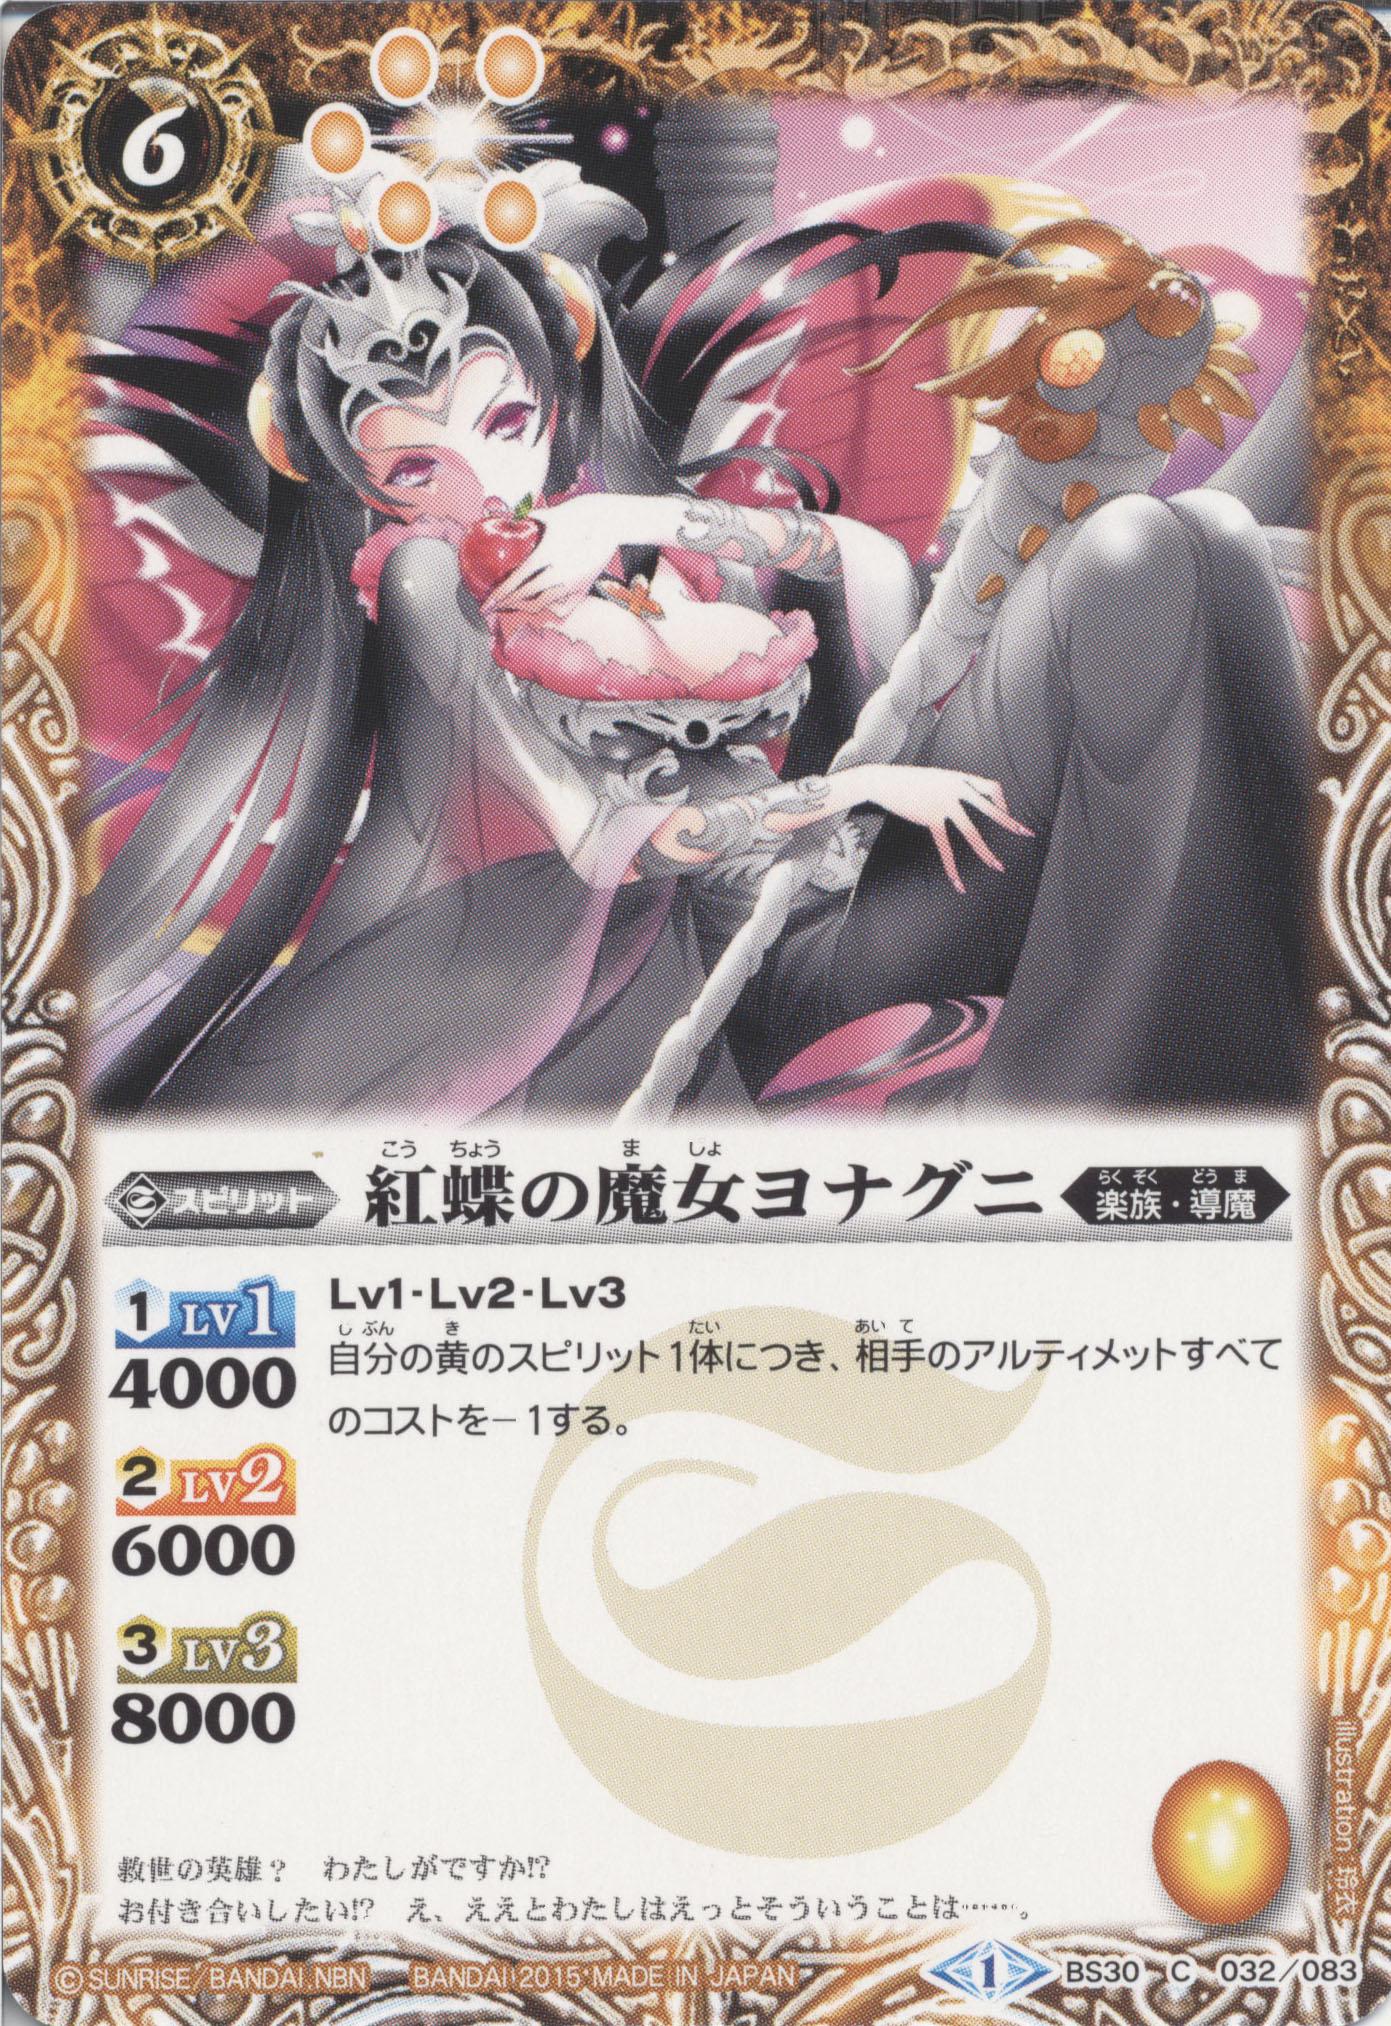 The CrimsonButterflyWitch Yonaguni